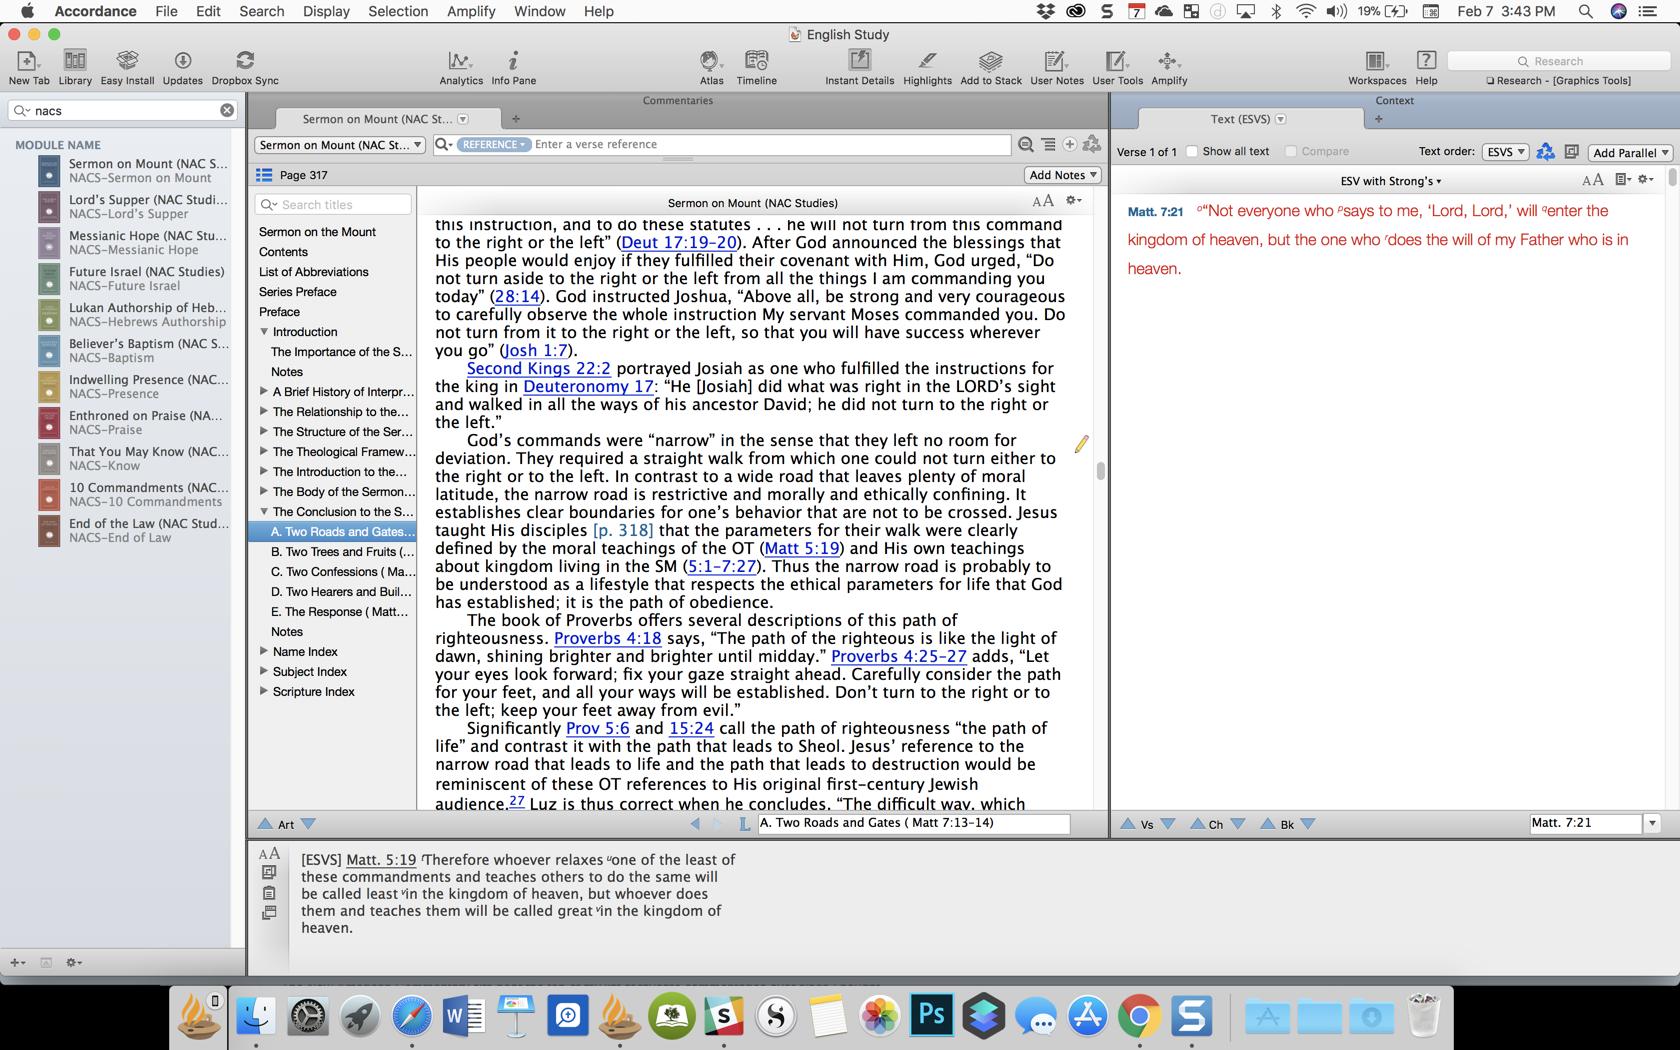 NACS in Accordance Bible Software